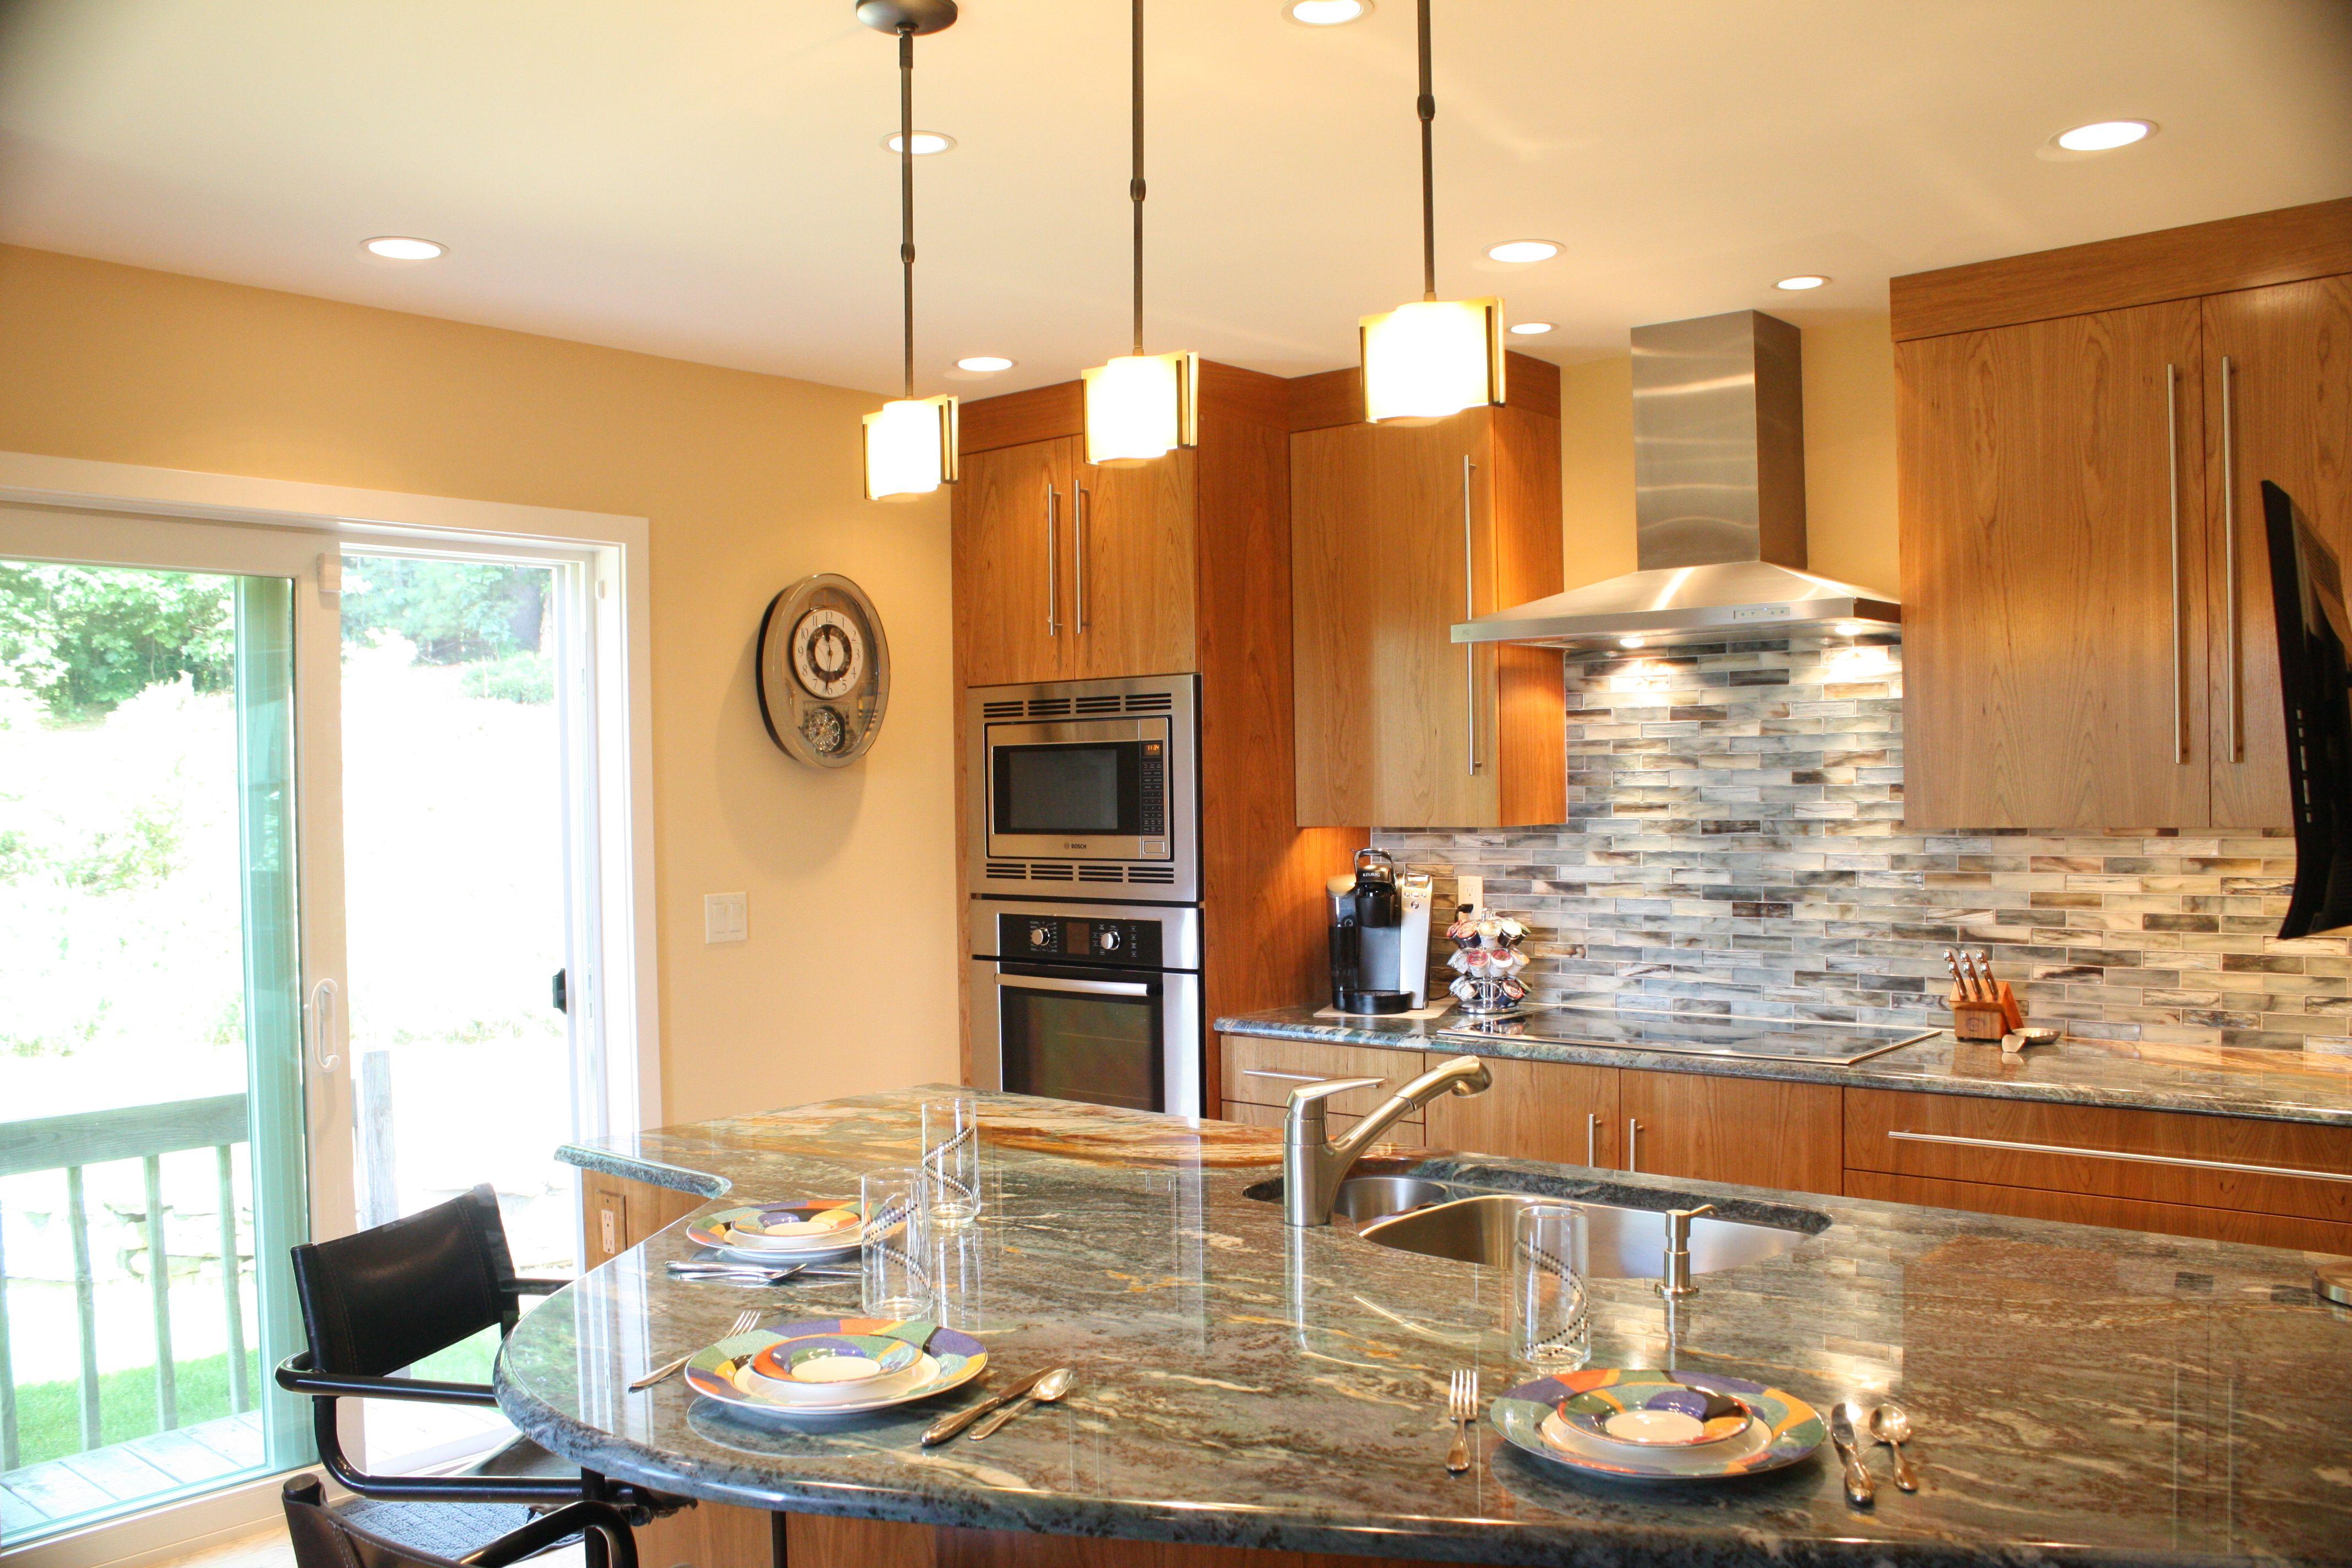 Cherry Wood Kitchen stainless steel appliances